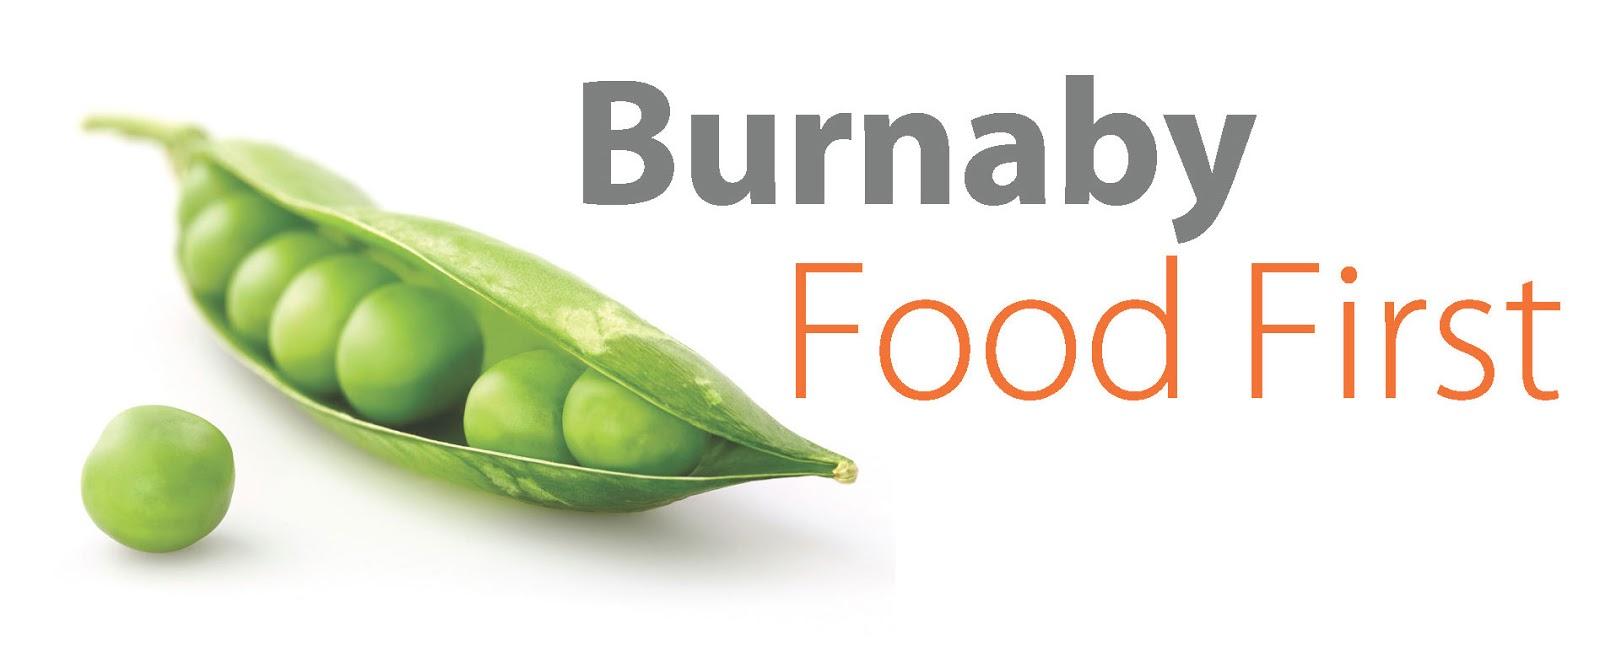 Hour Food Burnaby